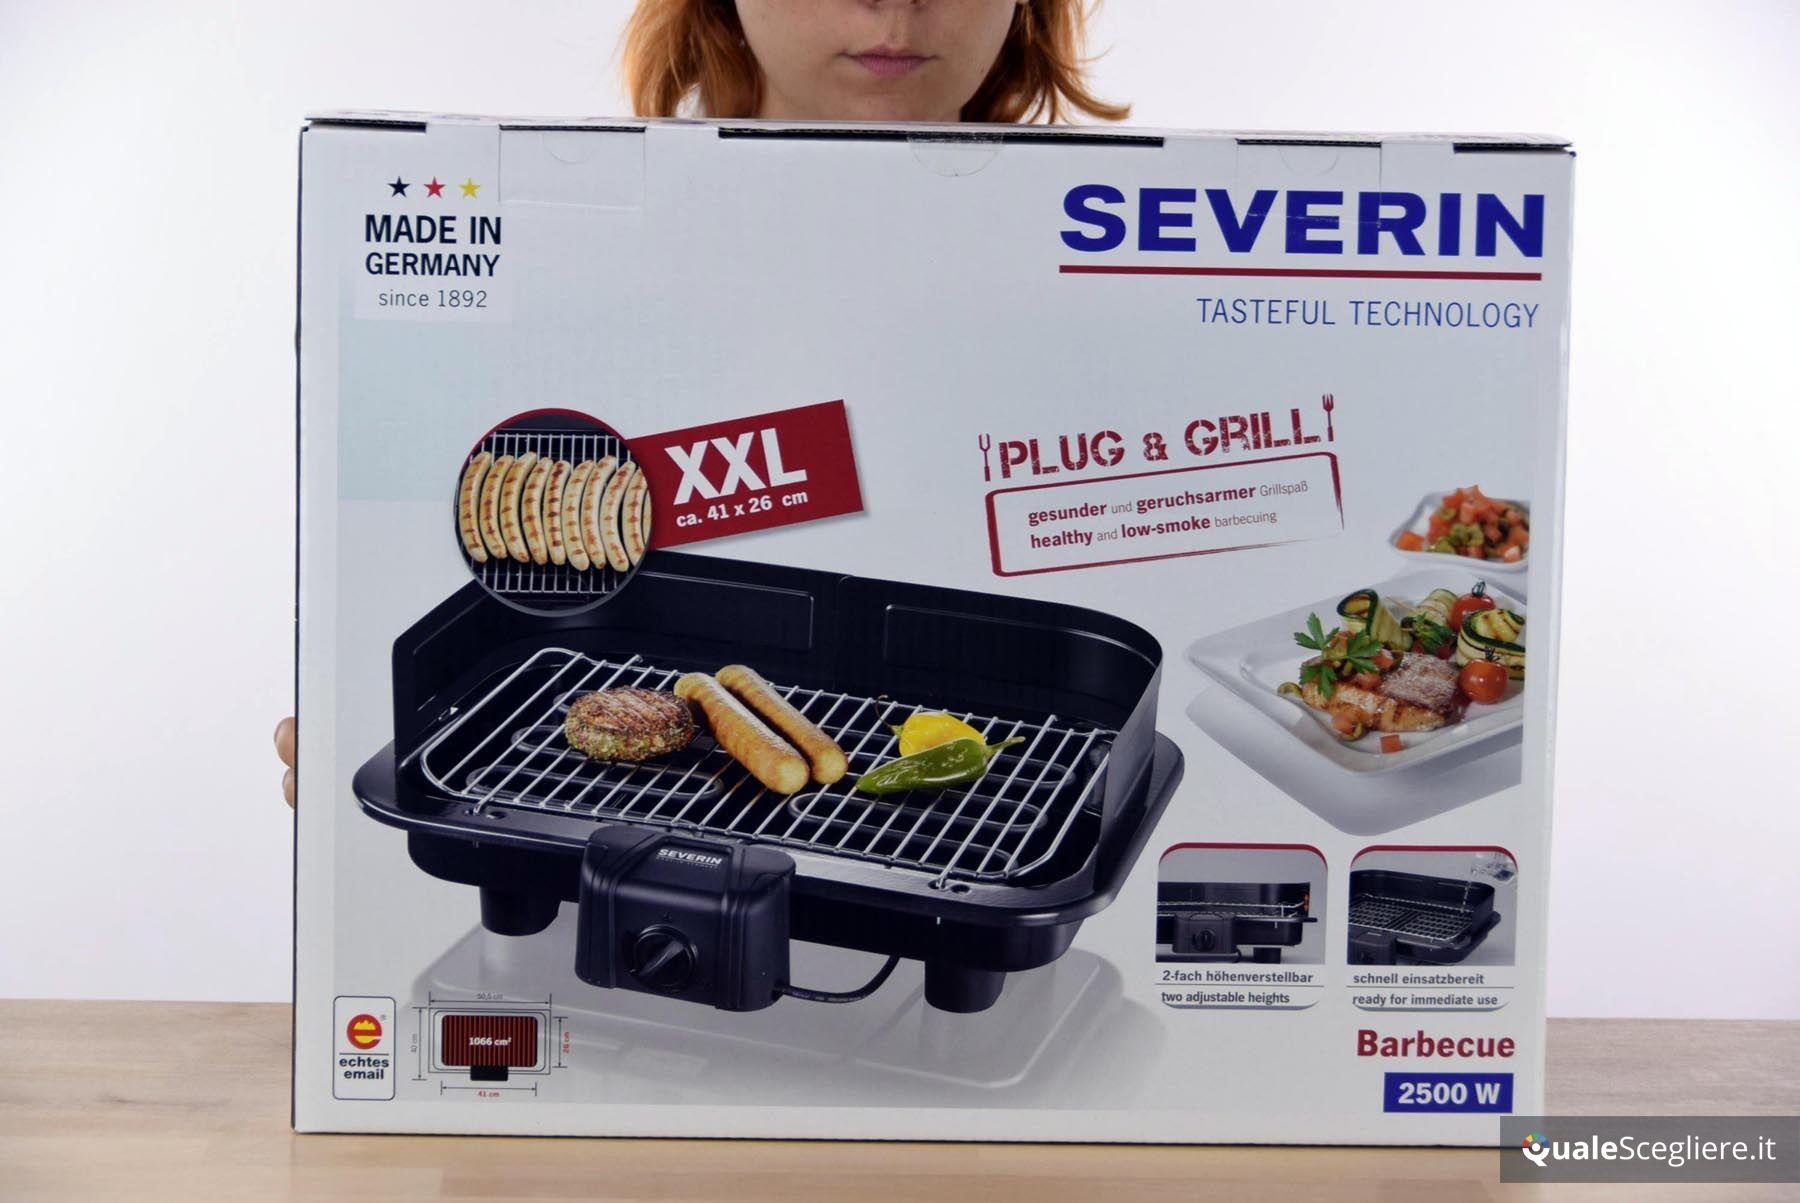 Severin Pg 9320 Barbecue Elektrogrill : Severin grill trendy severin grill with severin grill affordable